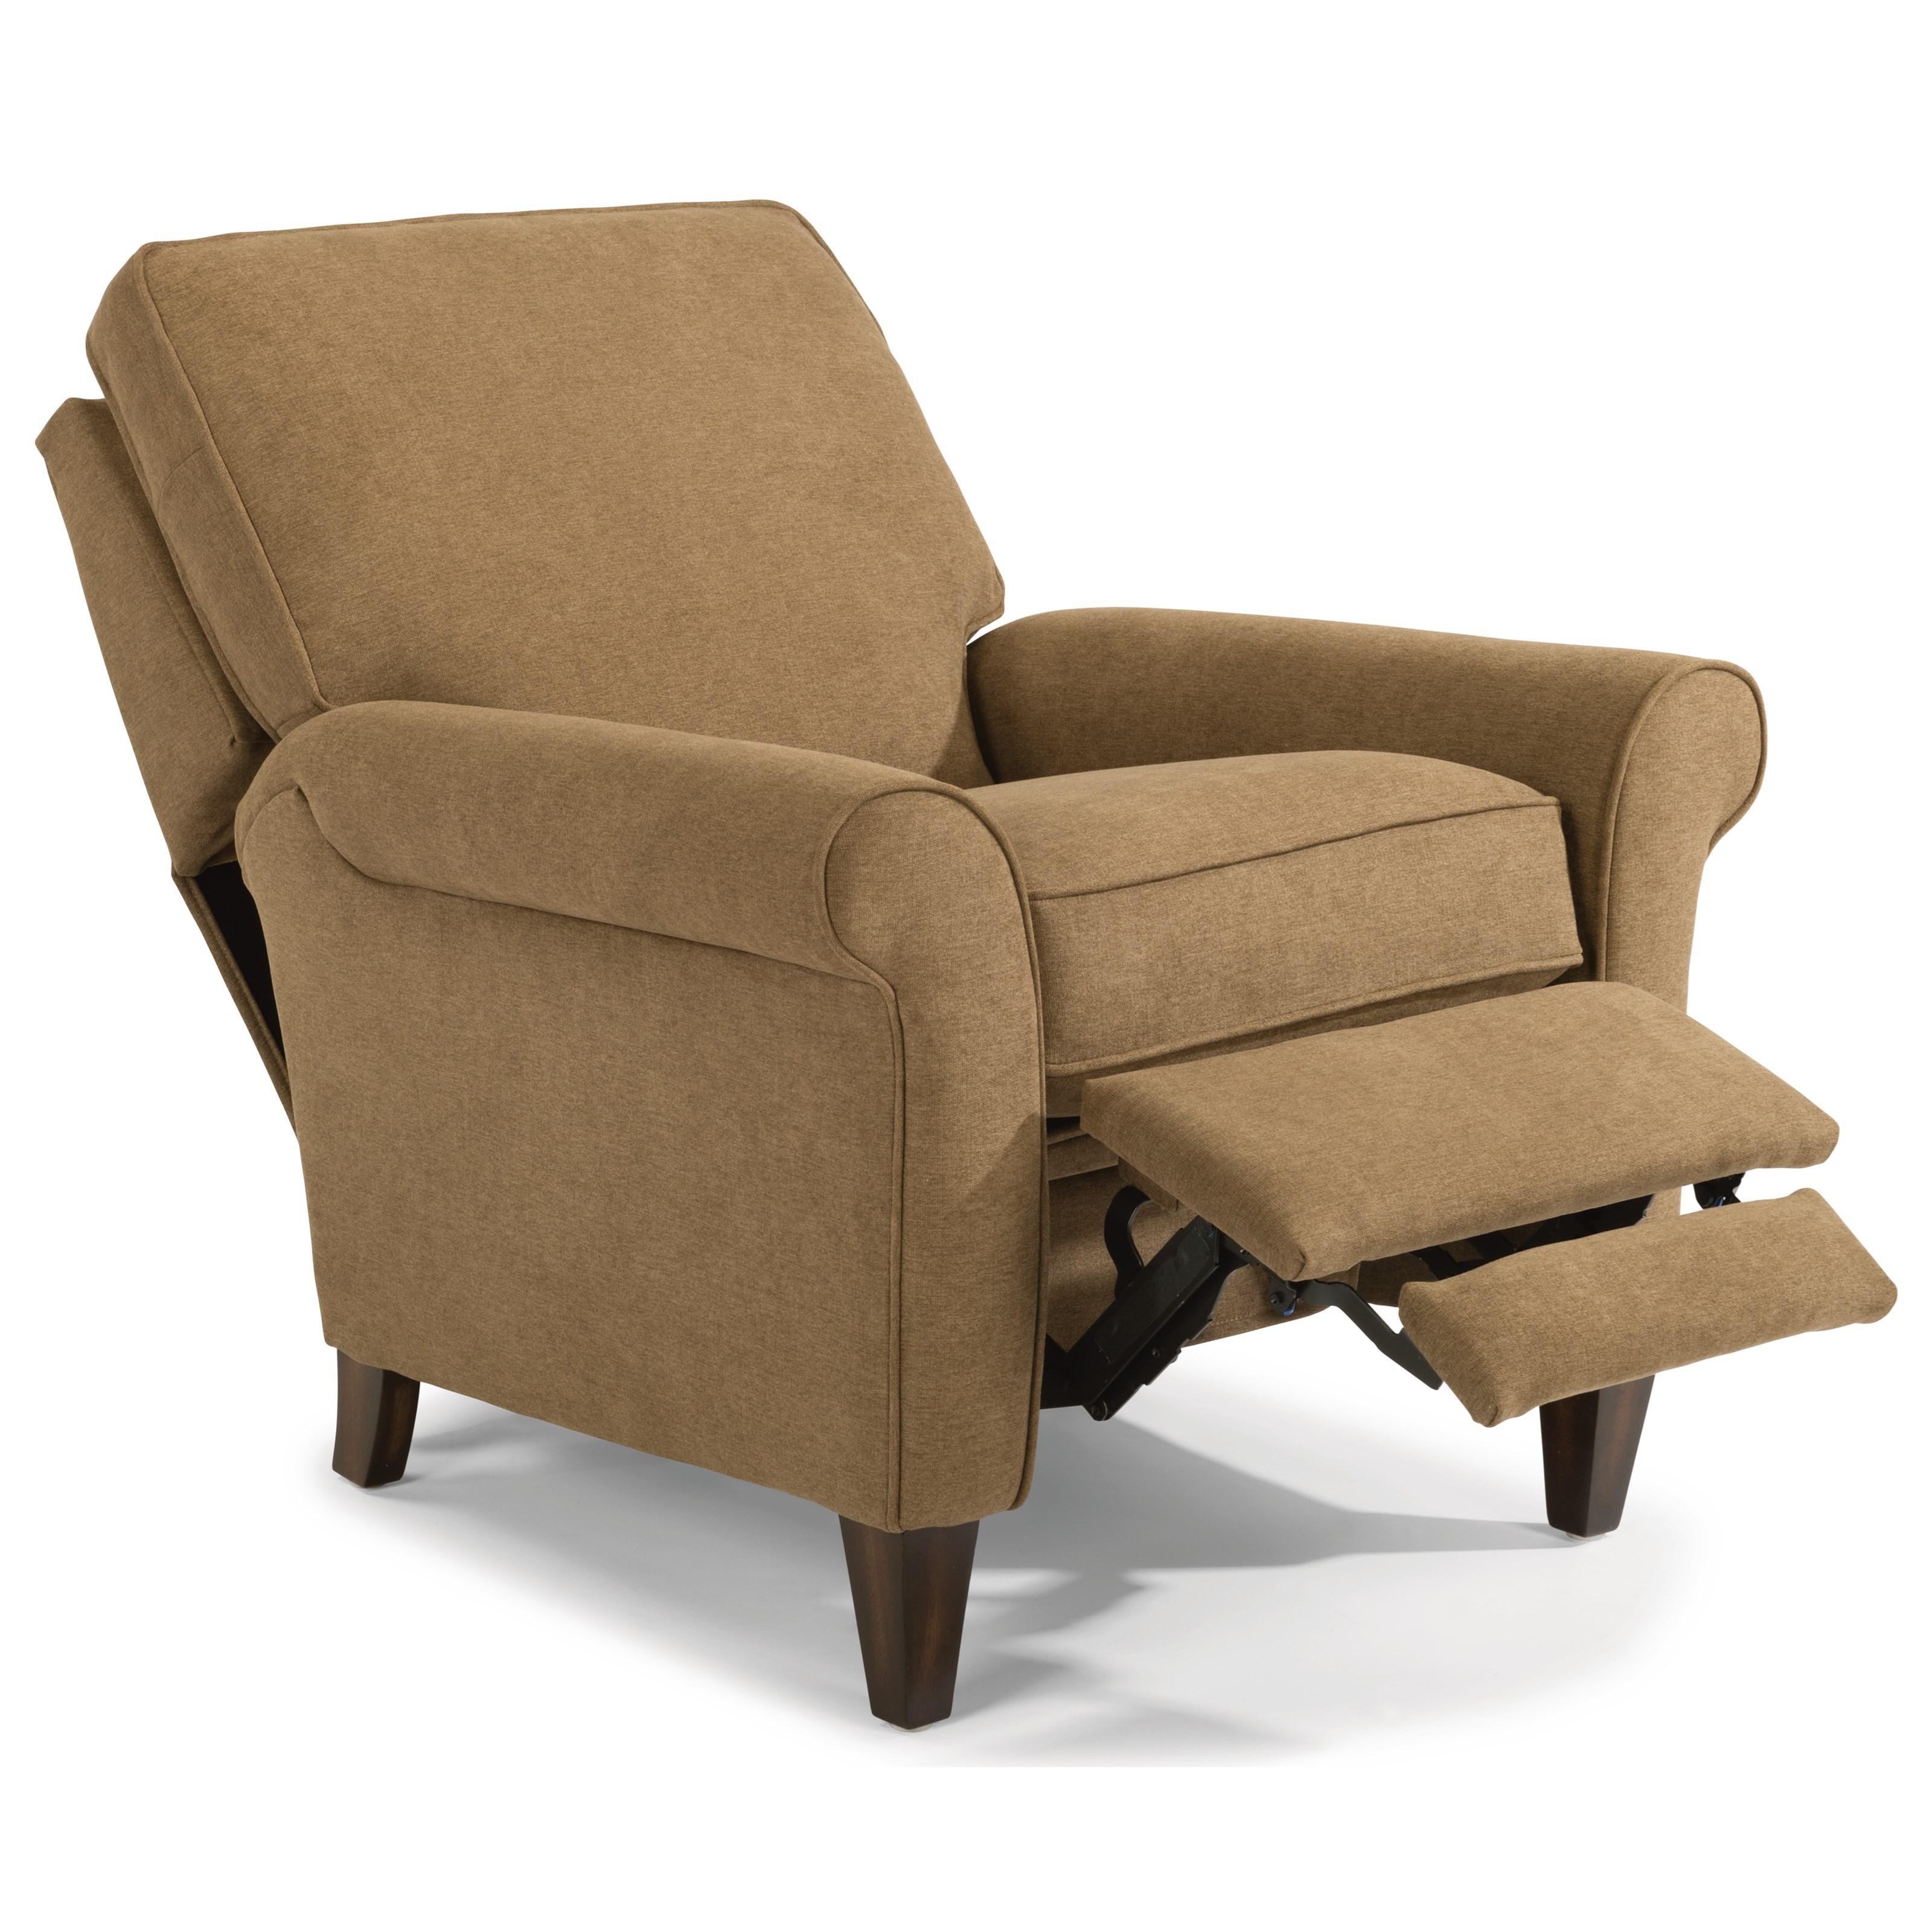 Flexsteel Westside Sofa Reviews: Flexsteel Westside Casual Style Power High Leg Recliner